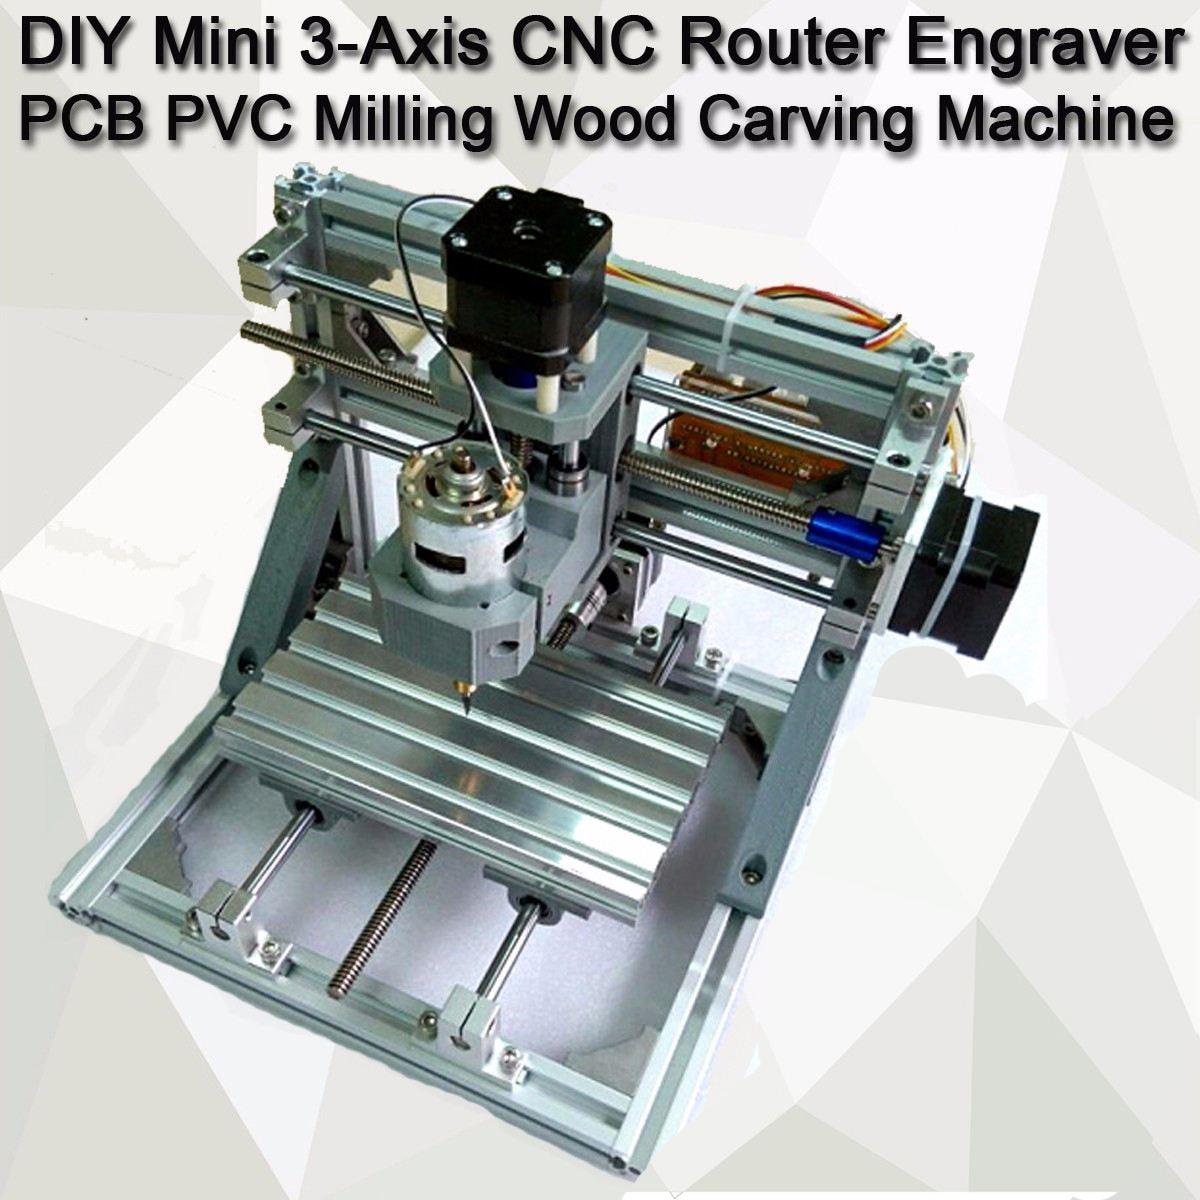 CNC 1610 GRBL Control Diy Mini 3 Axis Router CNC Machine Engraver PCB PVC Milling Wood Carving Machine Working Area 16x10.5x3cm